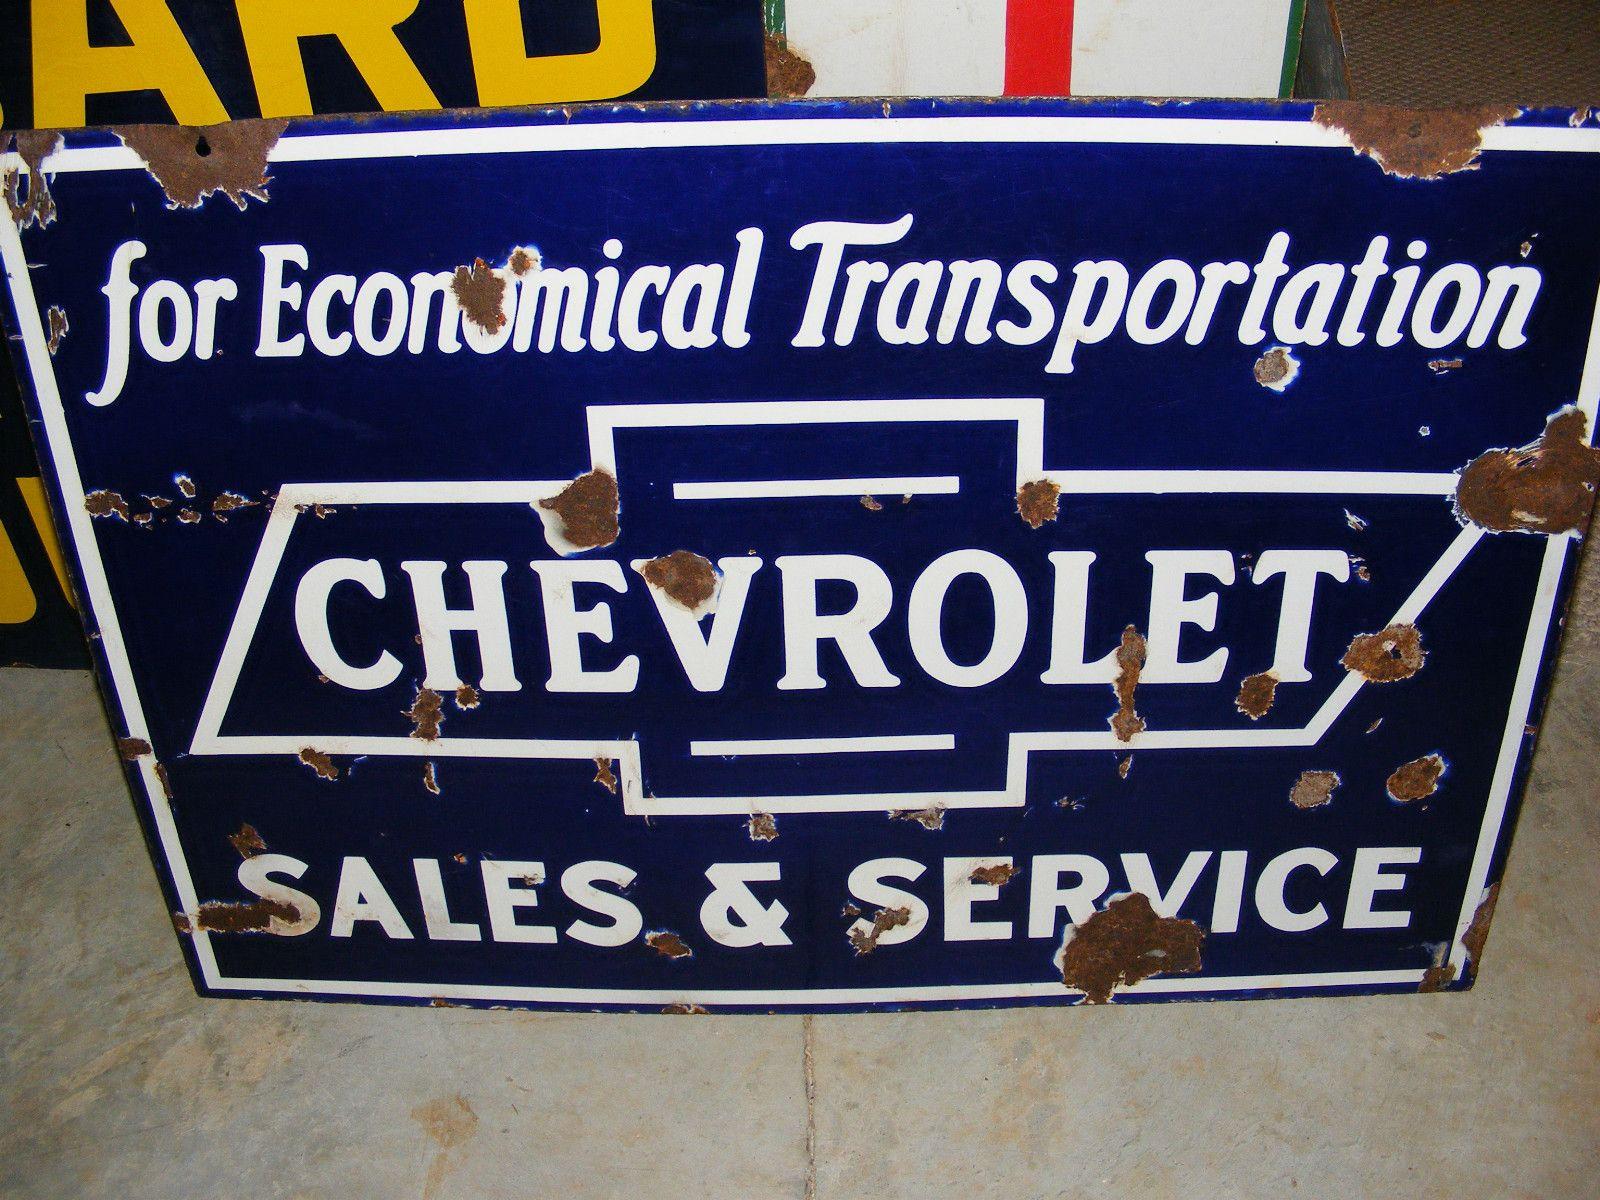 Unique Car Signs Ideas On Pinterest Car Dashboard - Car signs on dashboardlets be honest you have no idea what your car dashboard signs